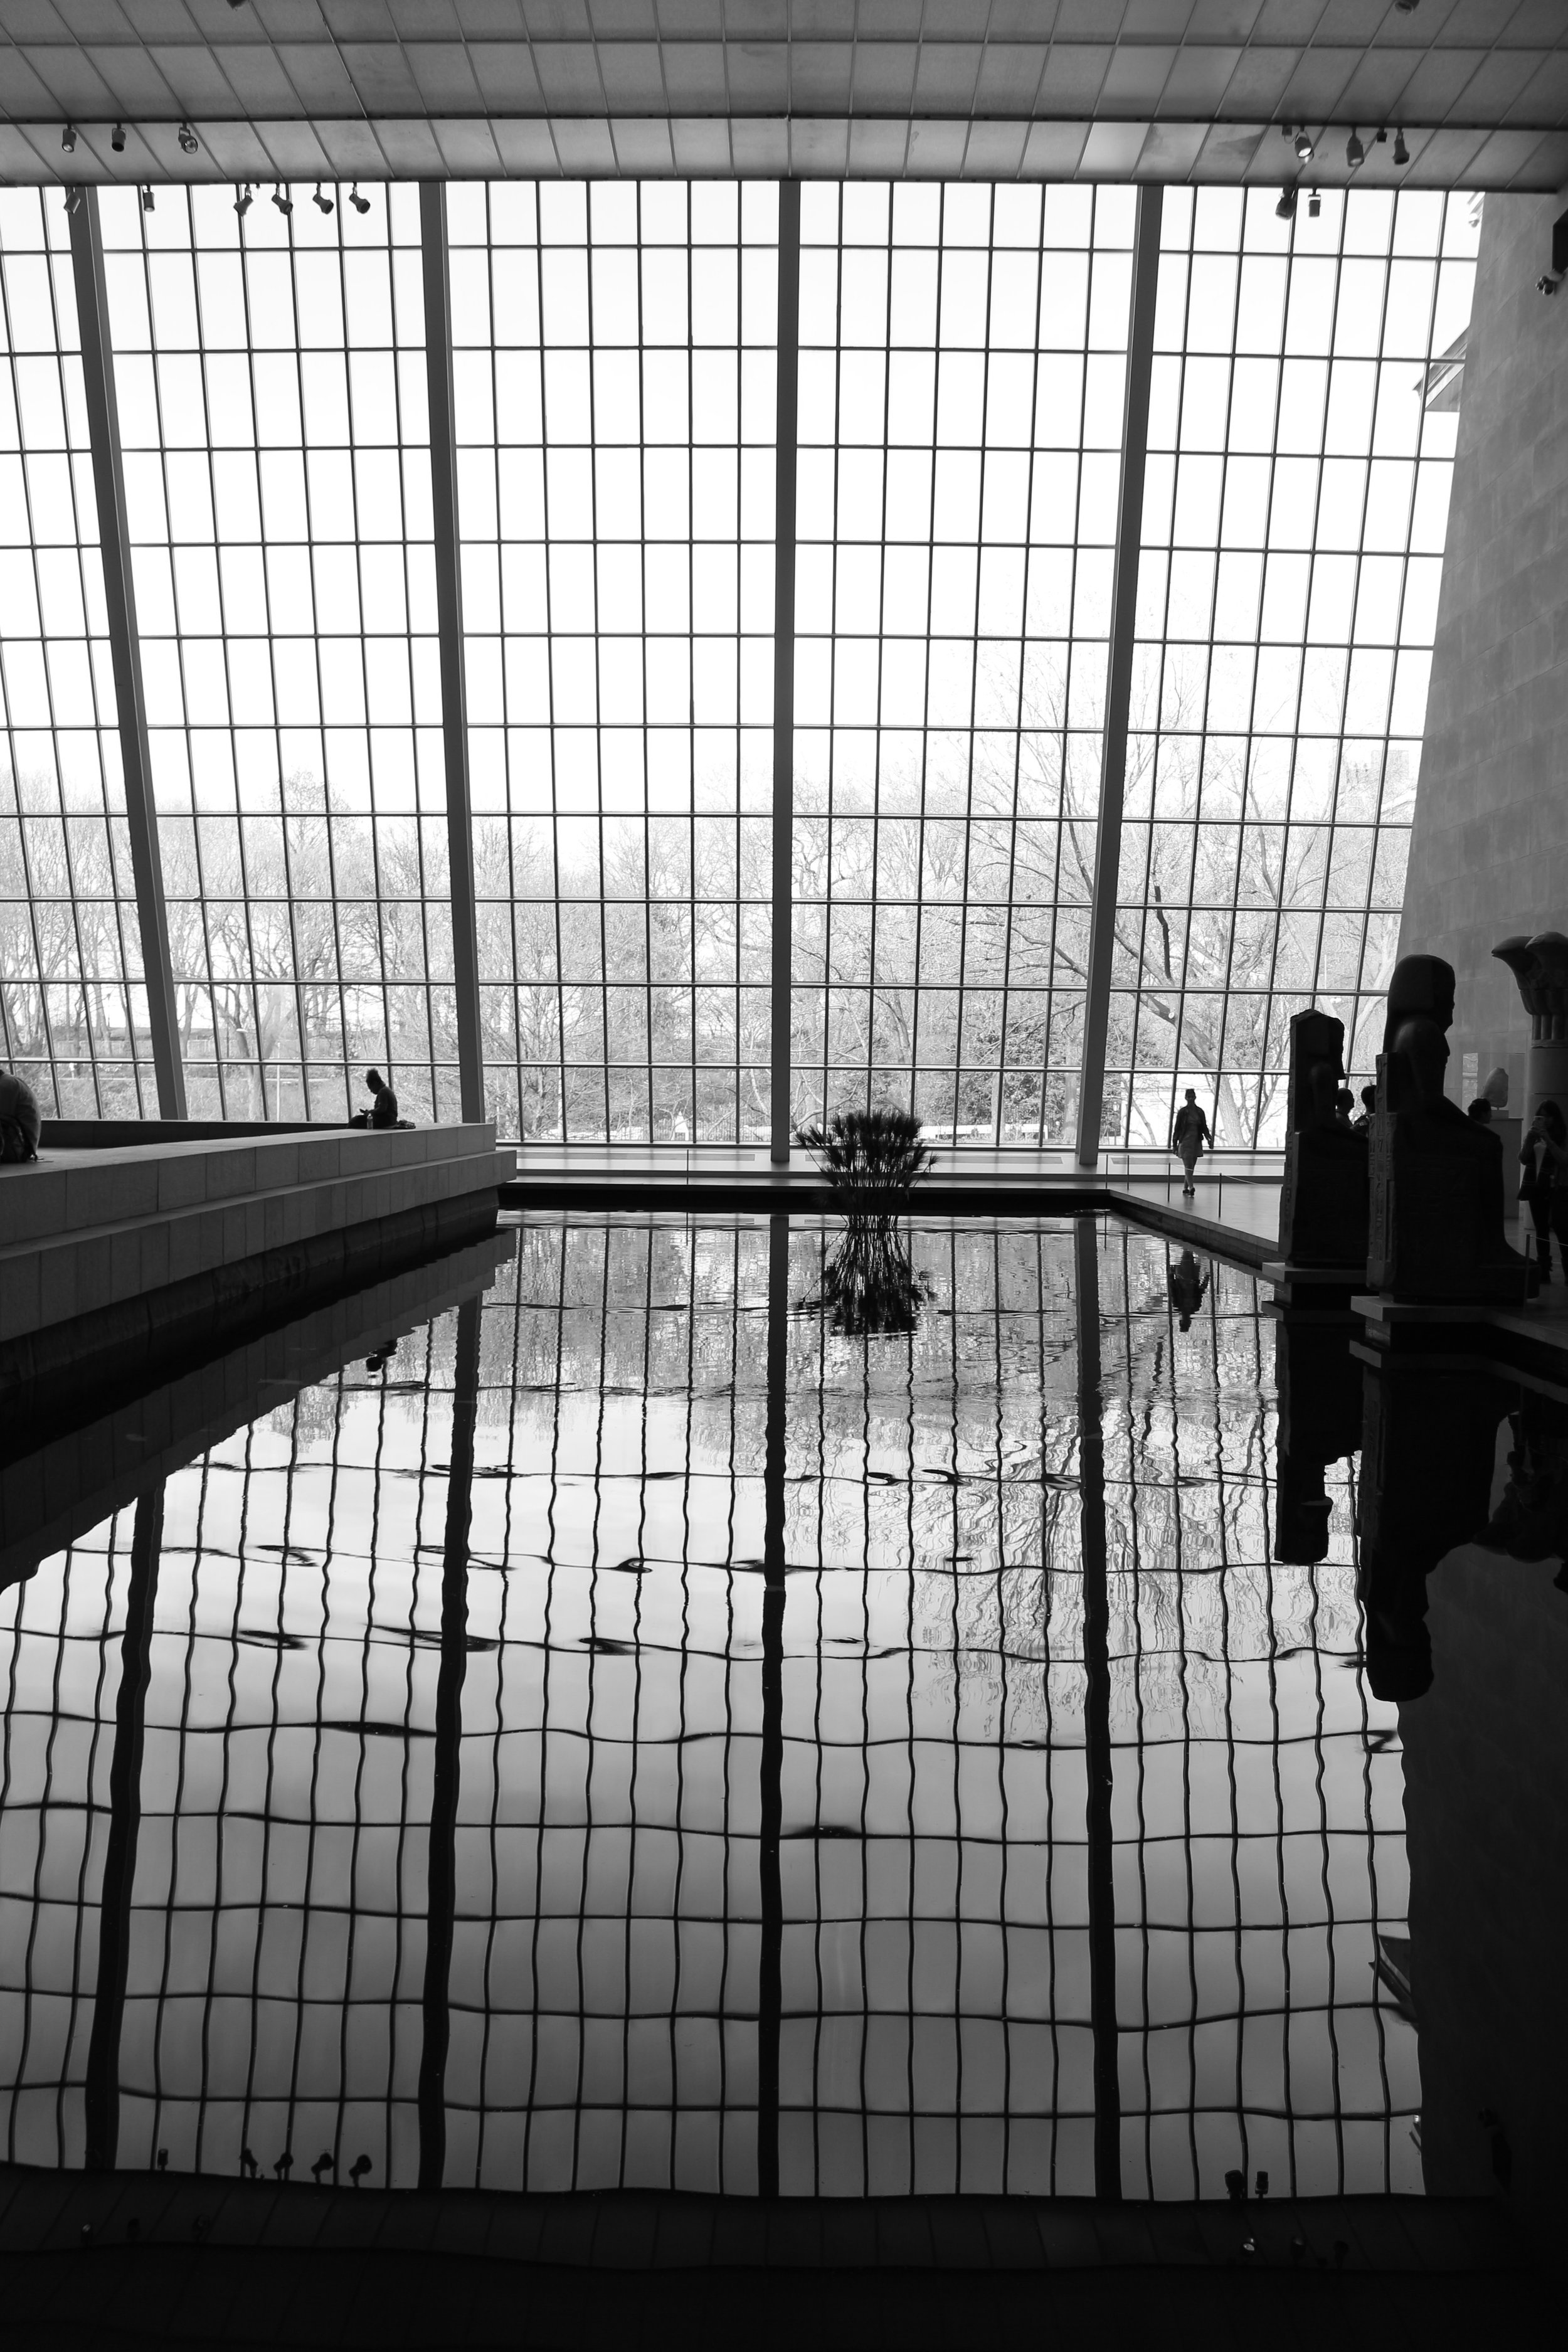 The Temple of Dendur, Metropolitan Museum of Art, New York, NY.